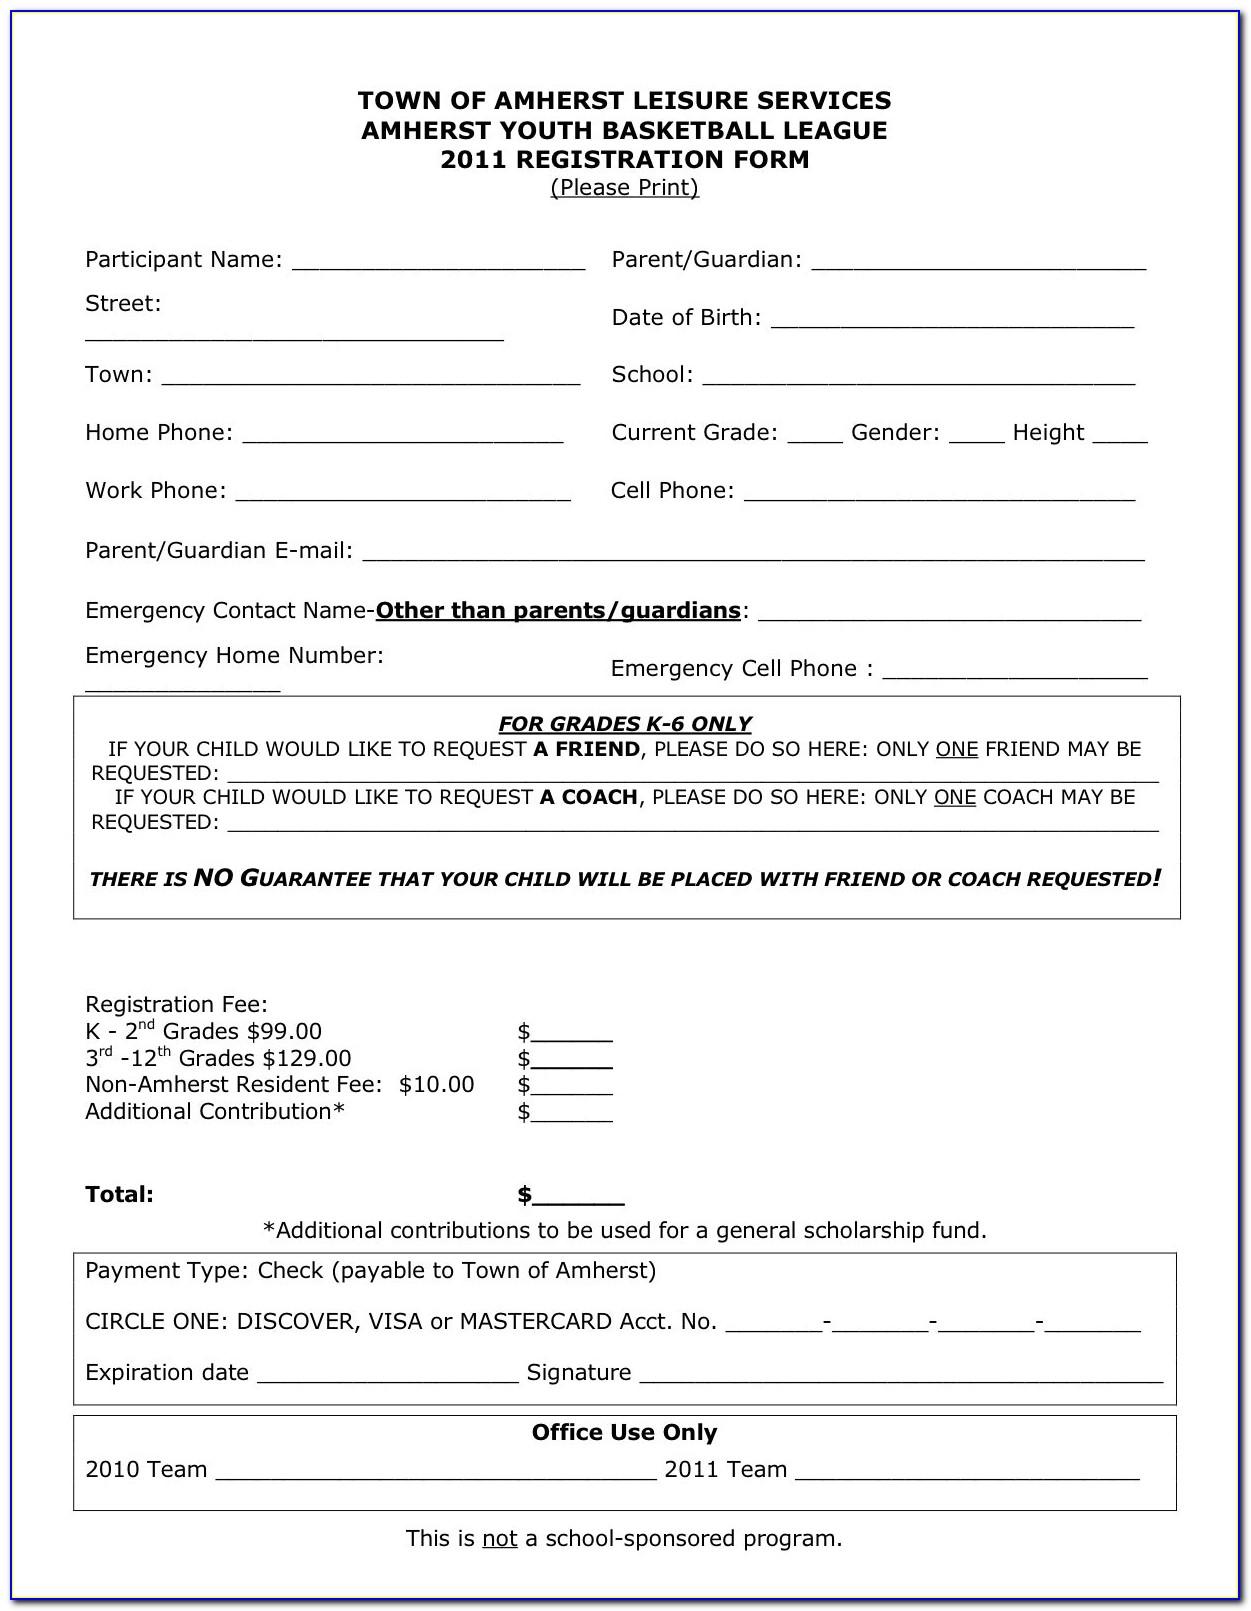 Printable Registration Form Template Sports Nancy Release Imagine Regarding Registration Form Template For Sports